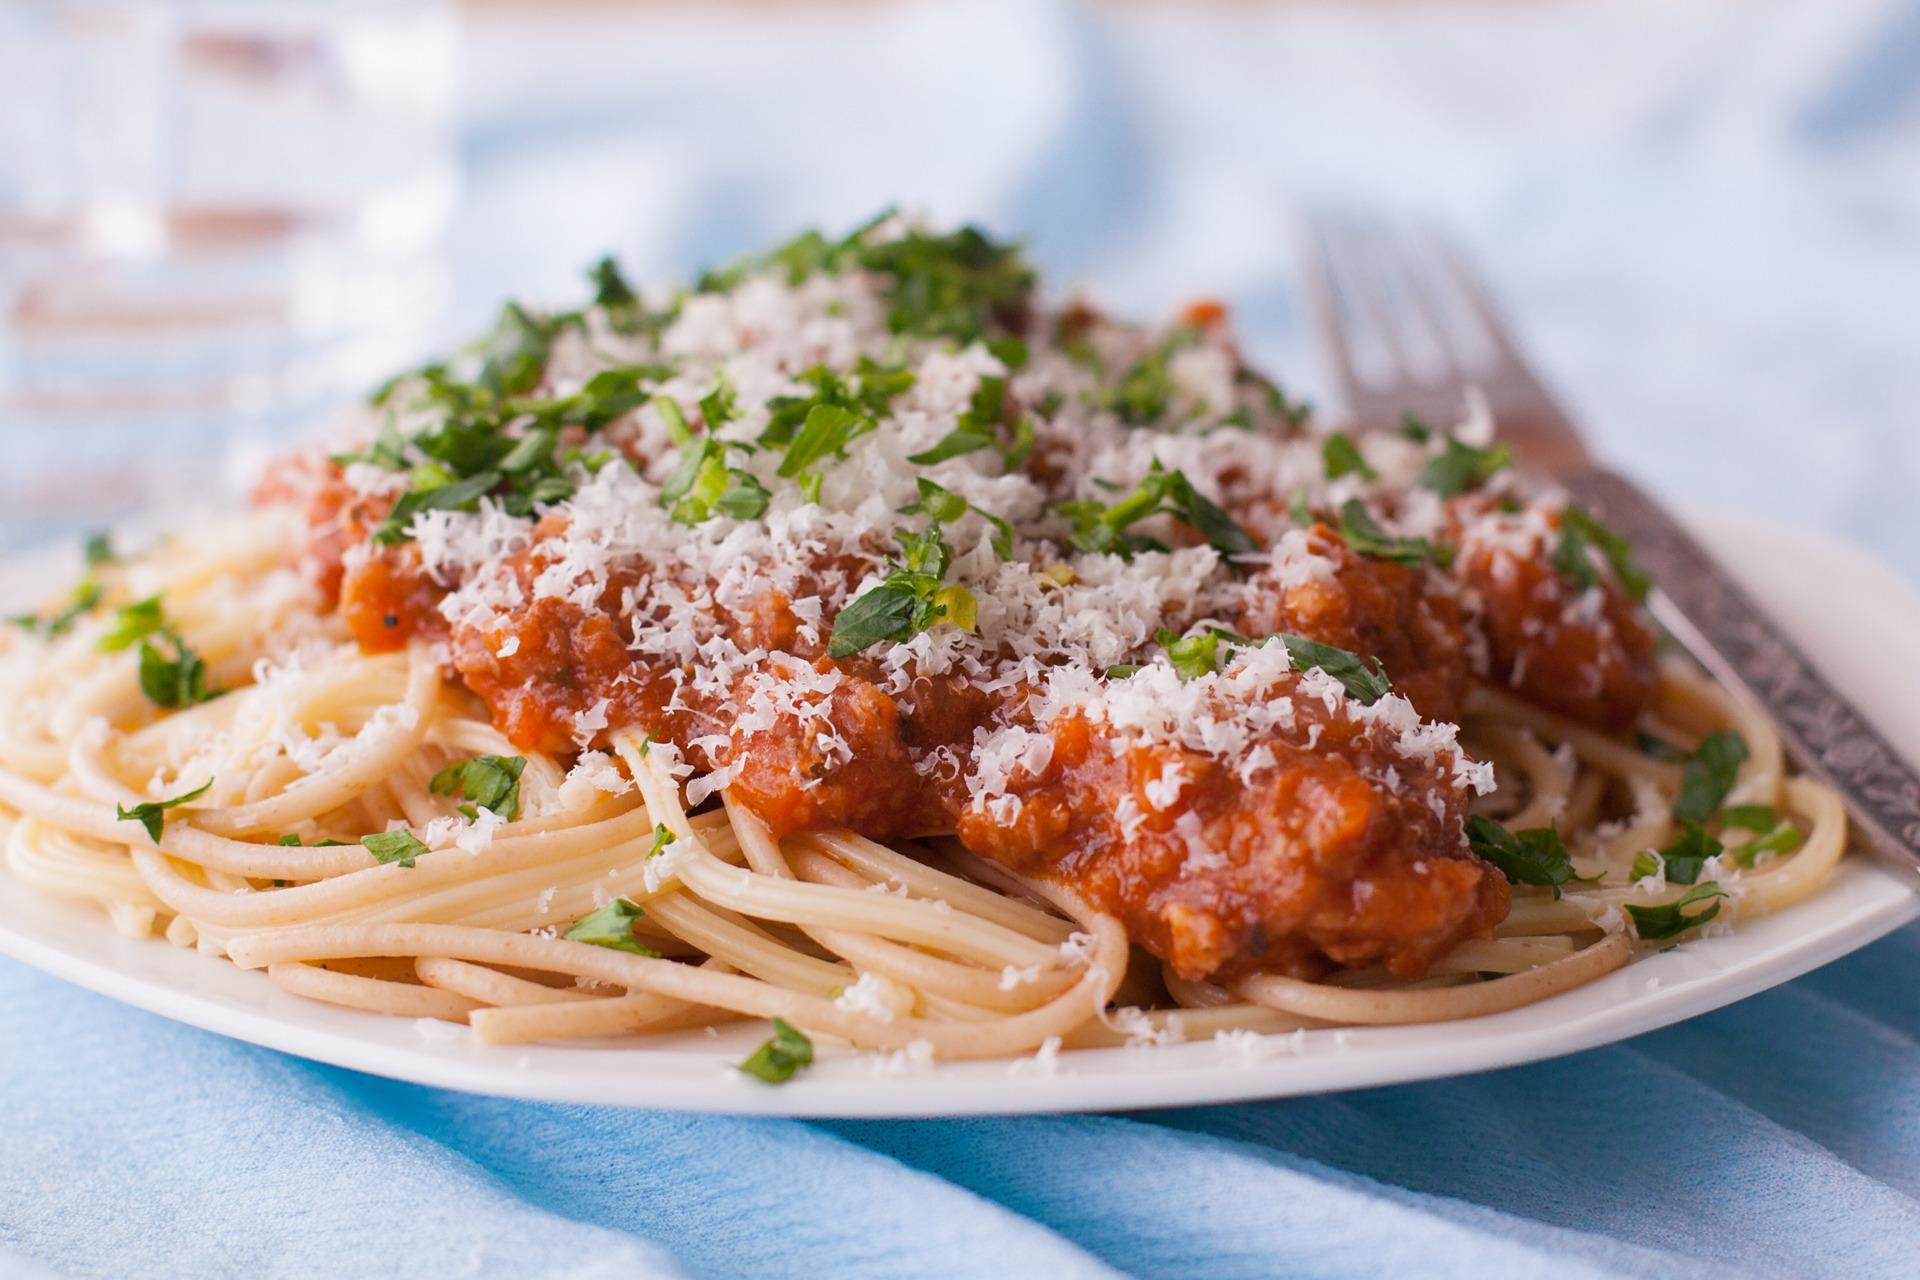 Italian pasta spaghetti manicotti ziti tortellini and more - Italian cuisine pasta ...